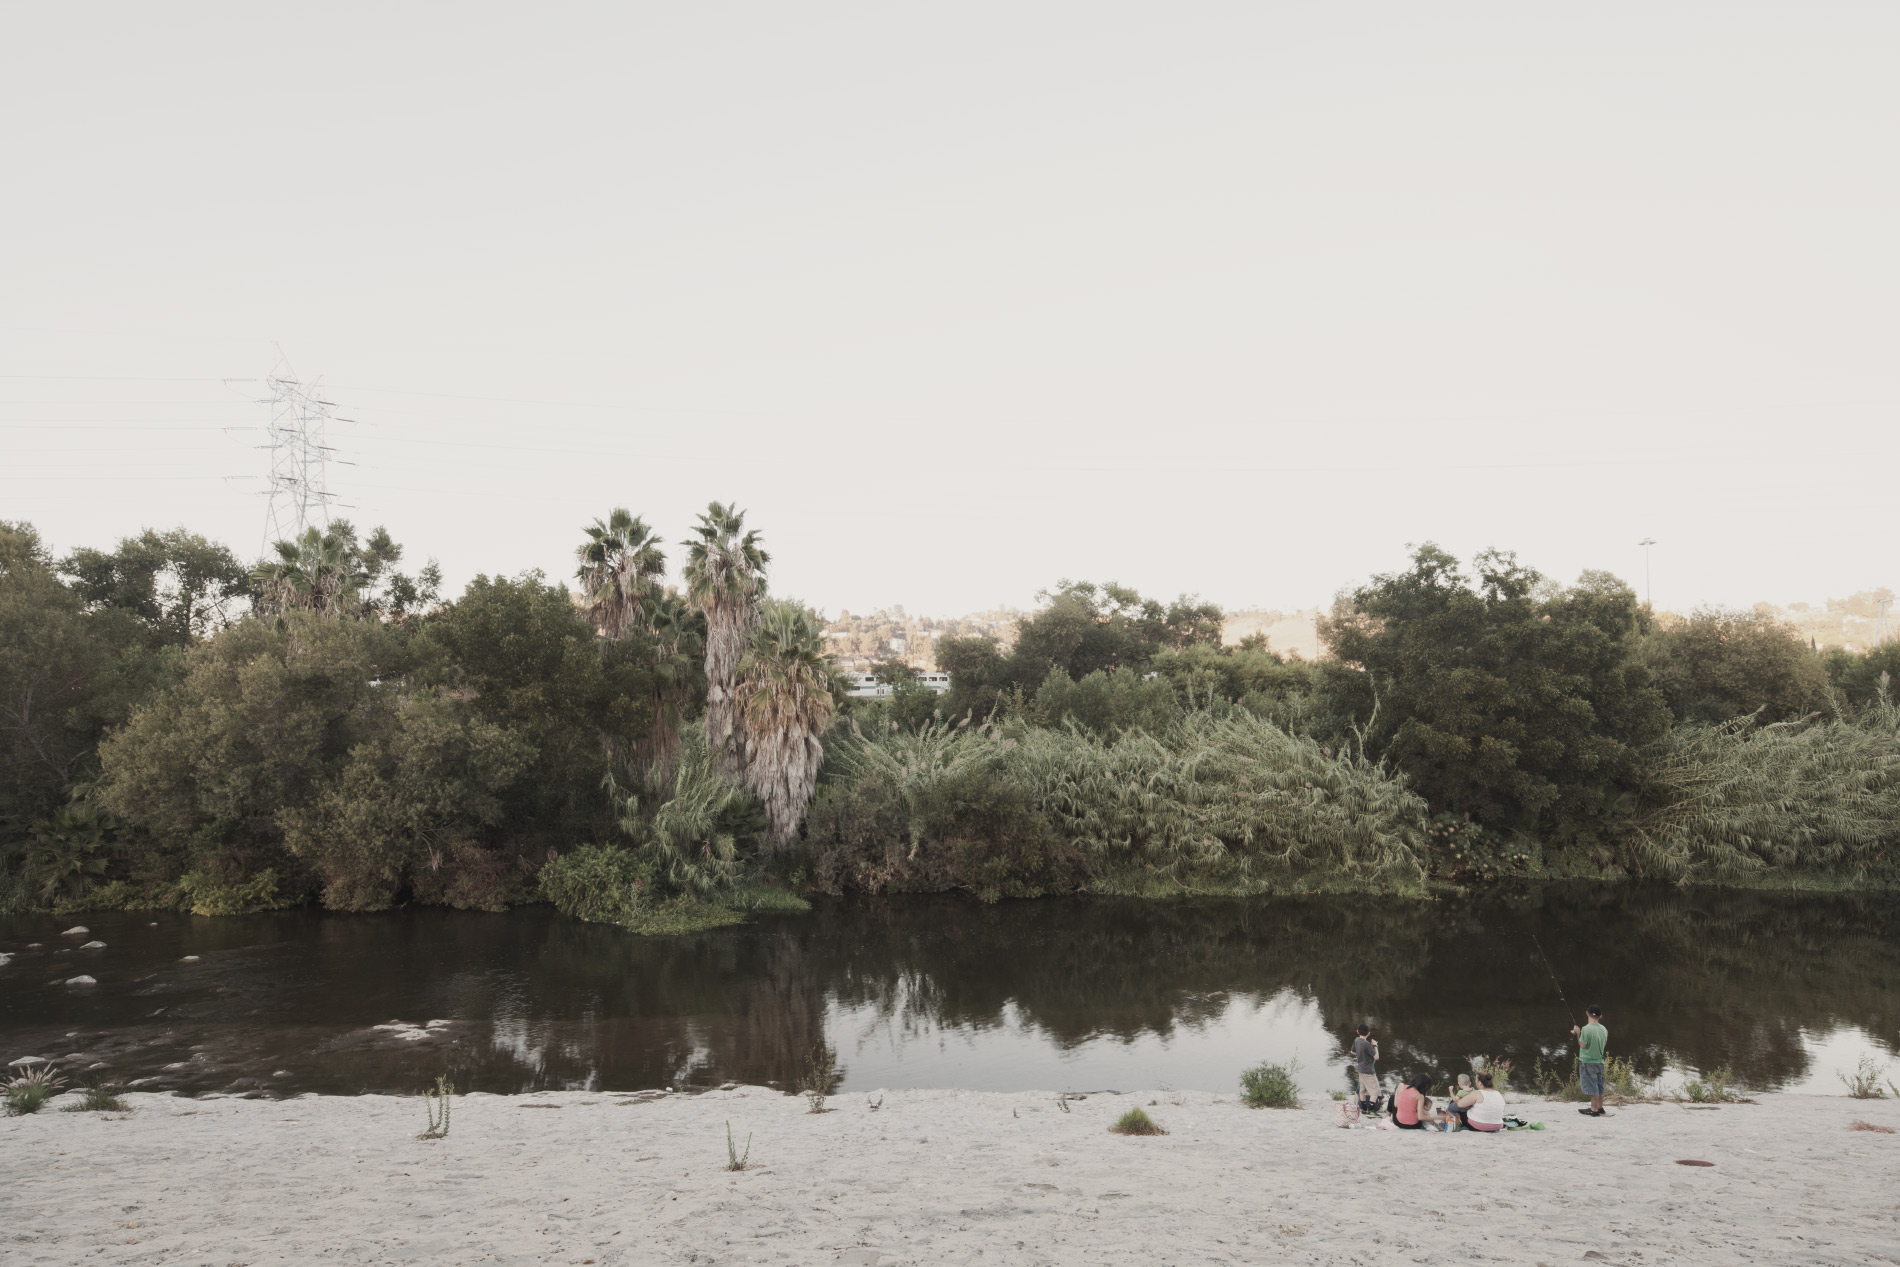 LA_River_select_174(1).jpg